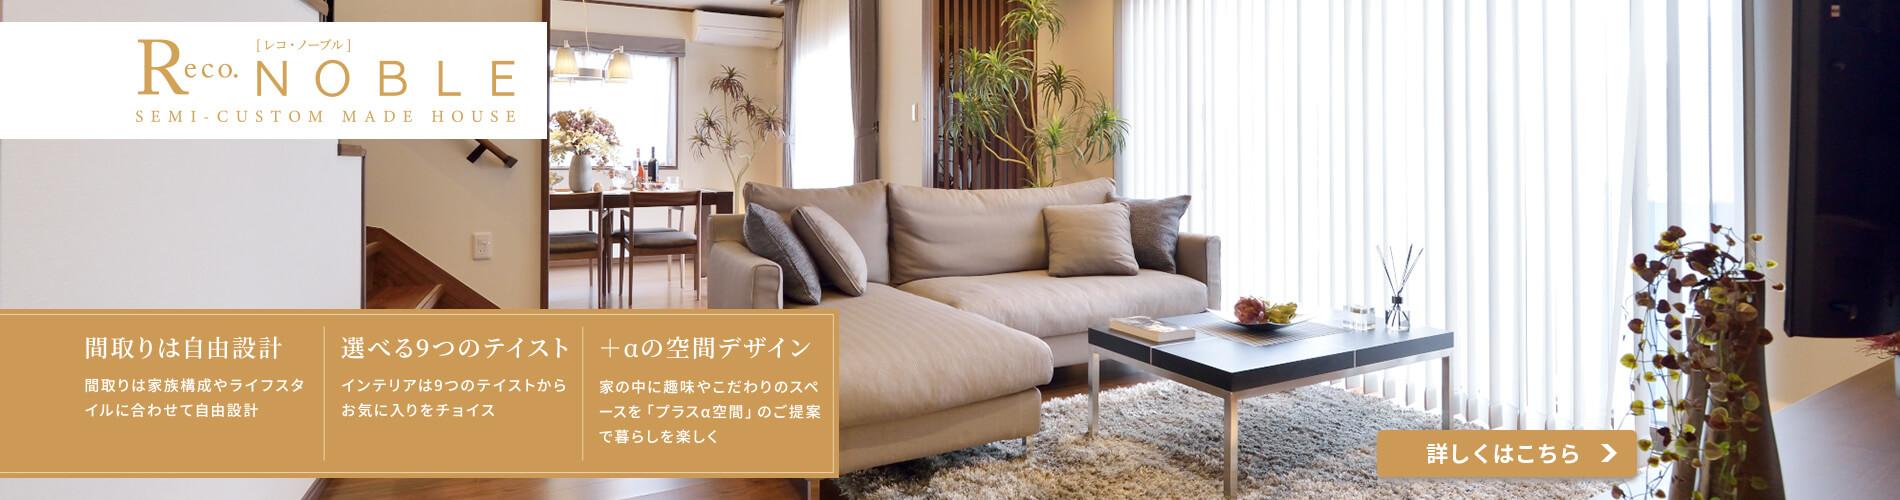 https://www.shikishima-j.co.jp/app-def/S-102/corporate/wp-content/uploads/2021/04/c_slider_pc.jpg